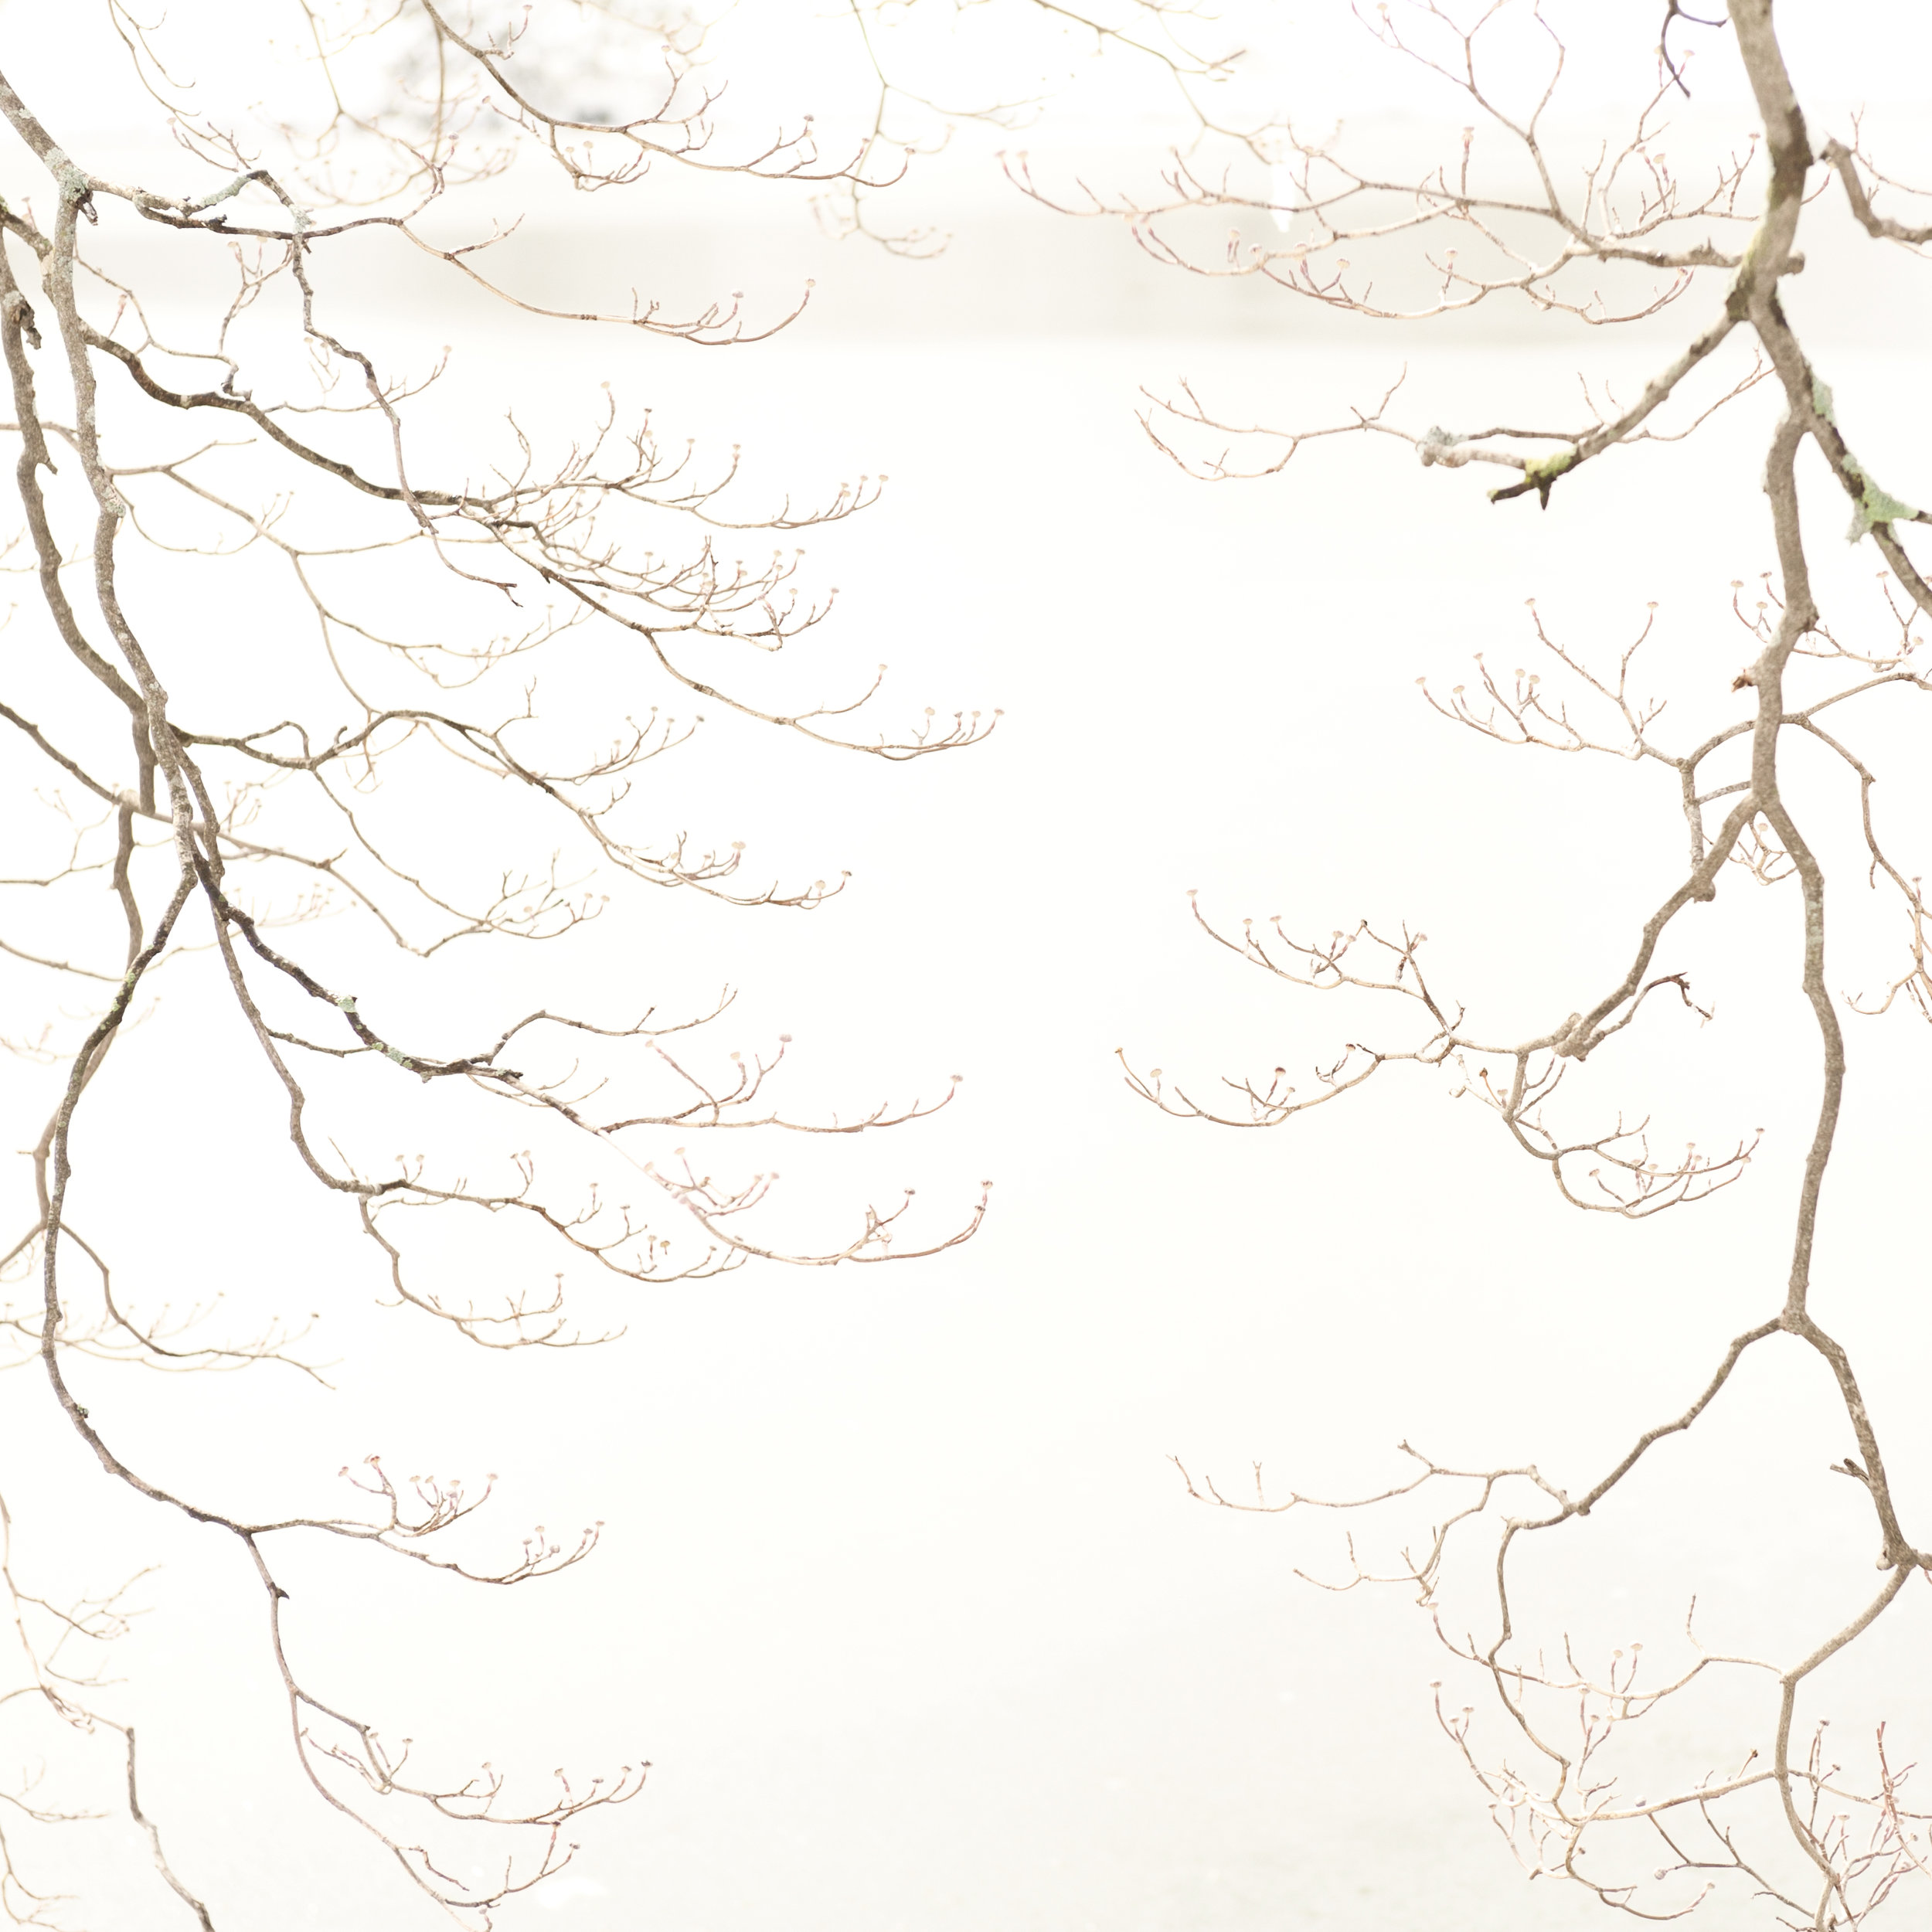 Study in Snow, Dogwood Tree, 4